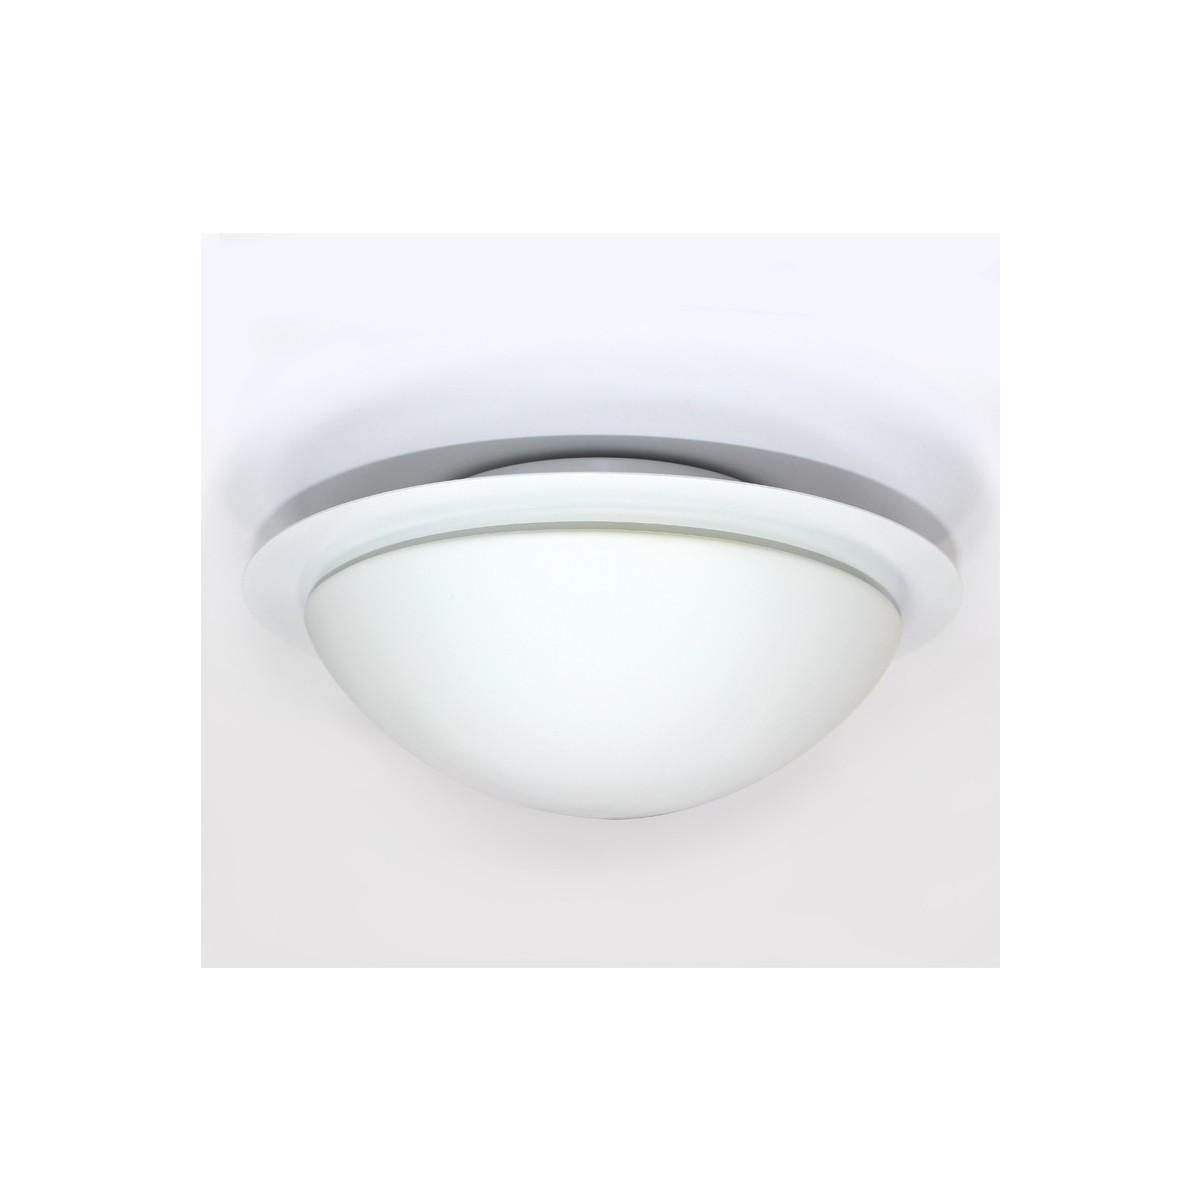 Plafón redondo LED 9W, 650Lm, 4200K